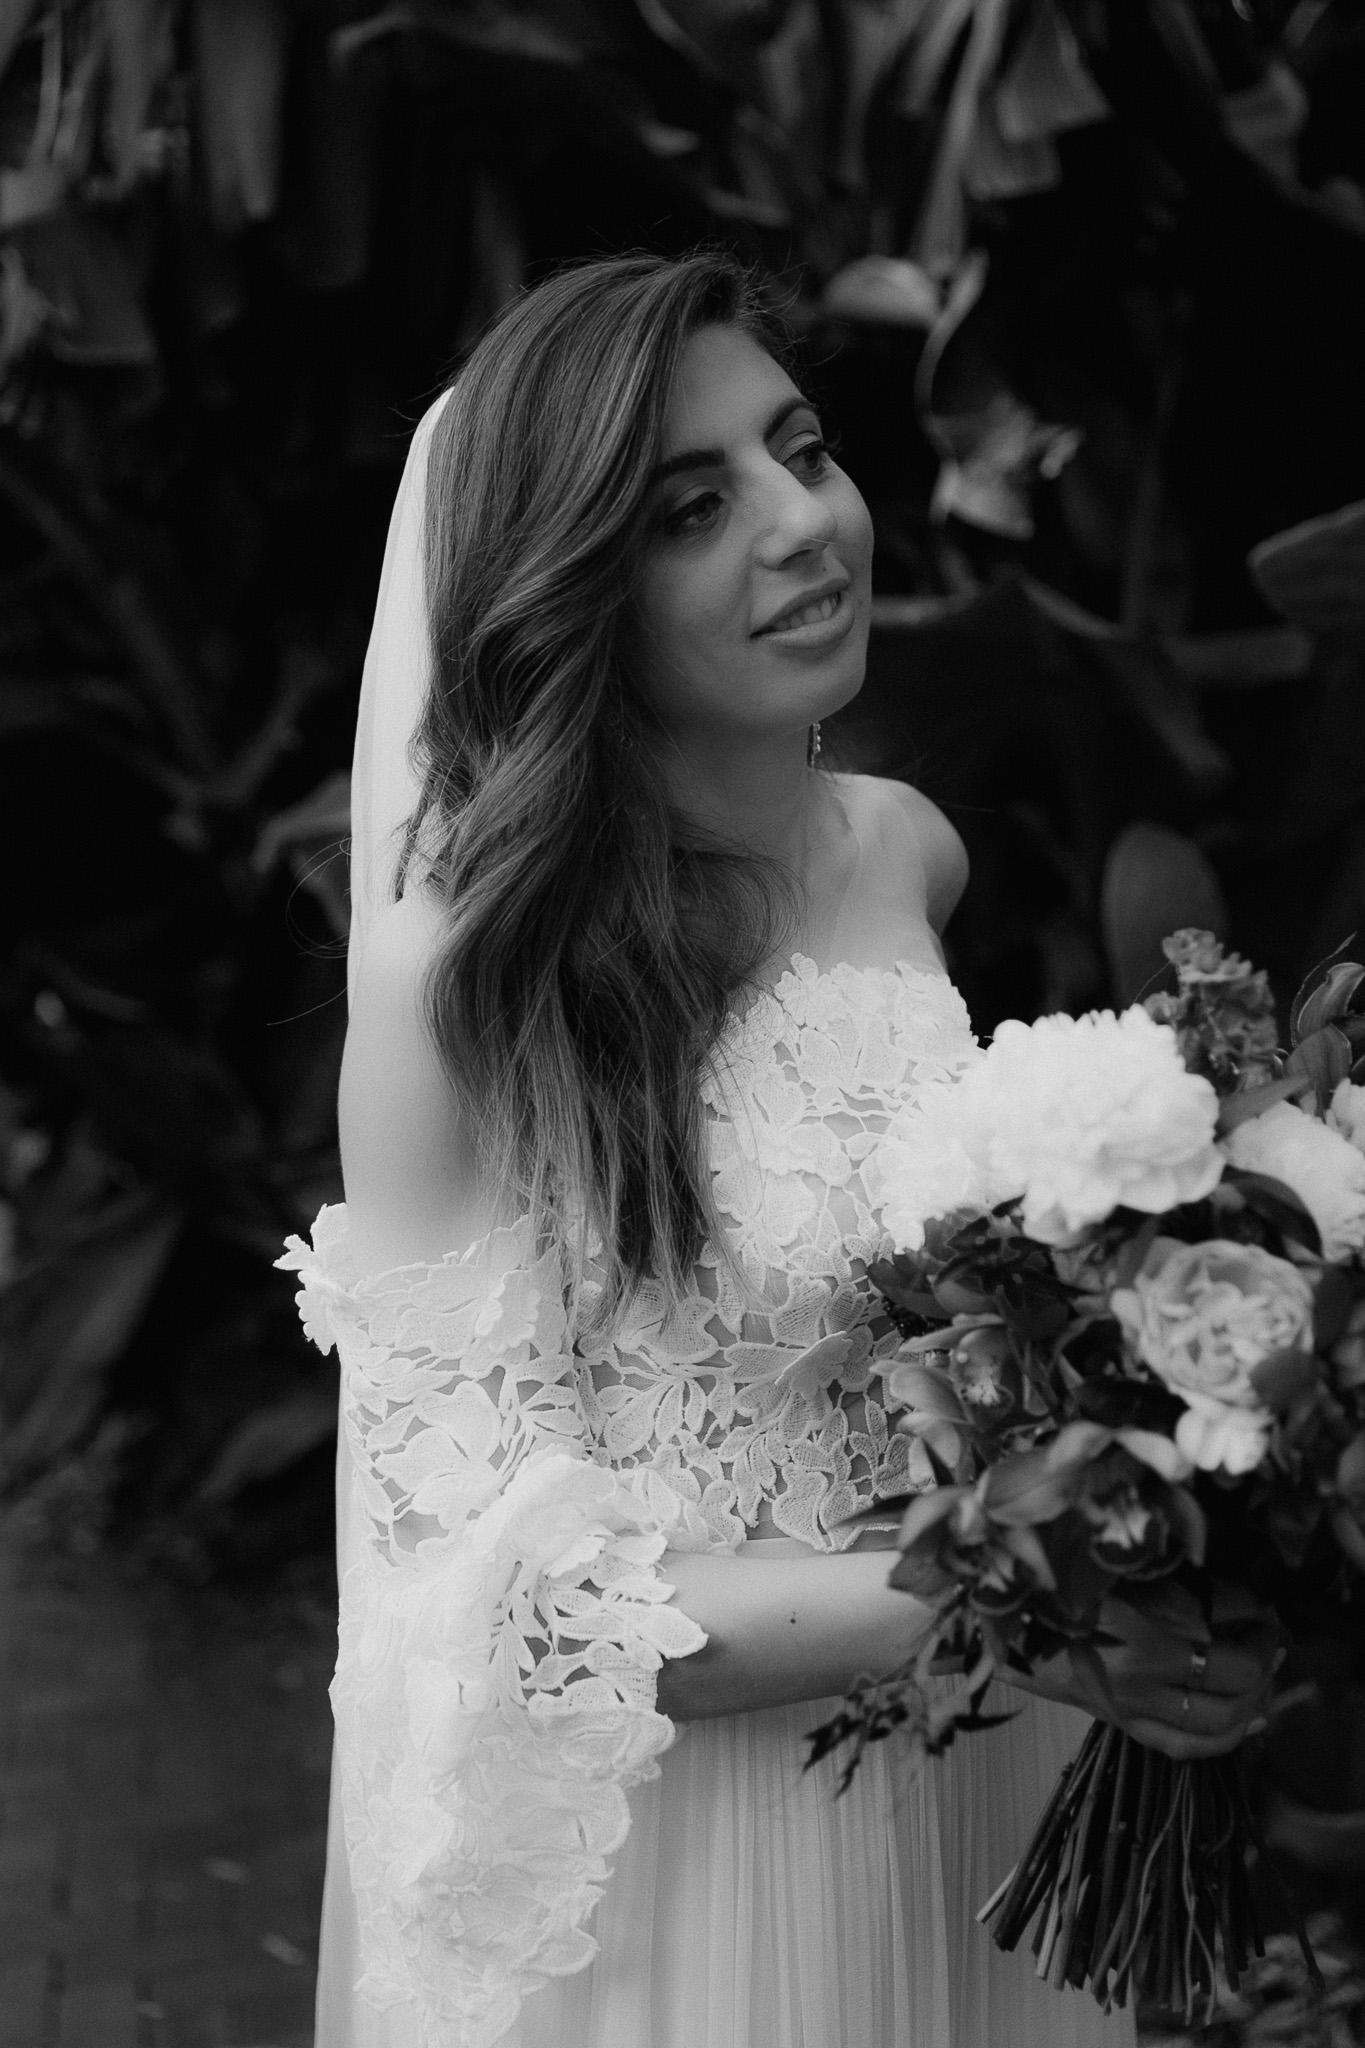 Liz+Alex_2017_credit_OneDaySomewherePhotography-277.jpg